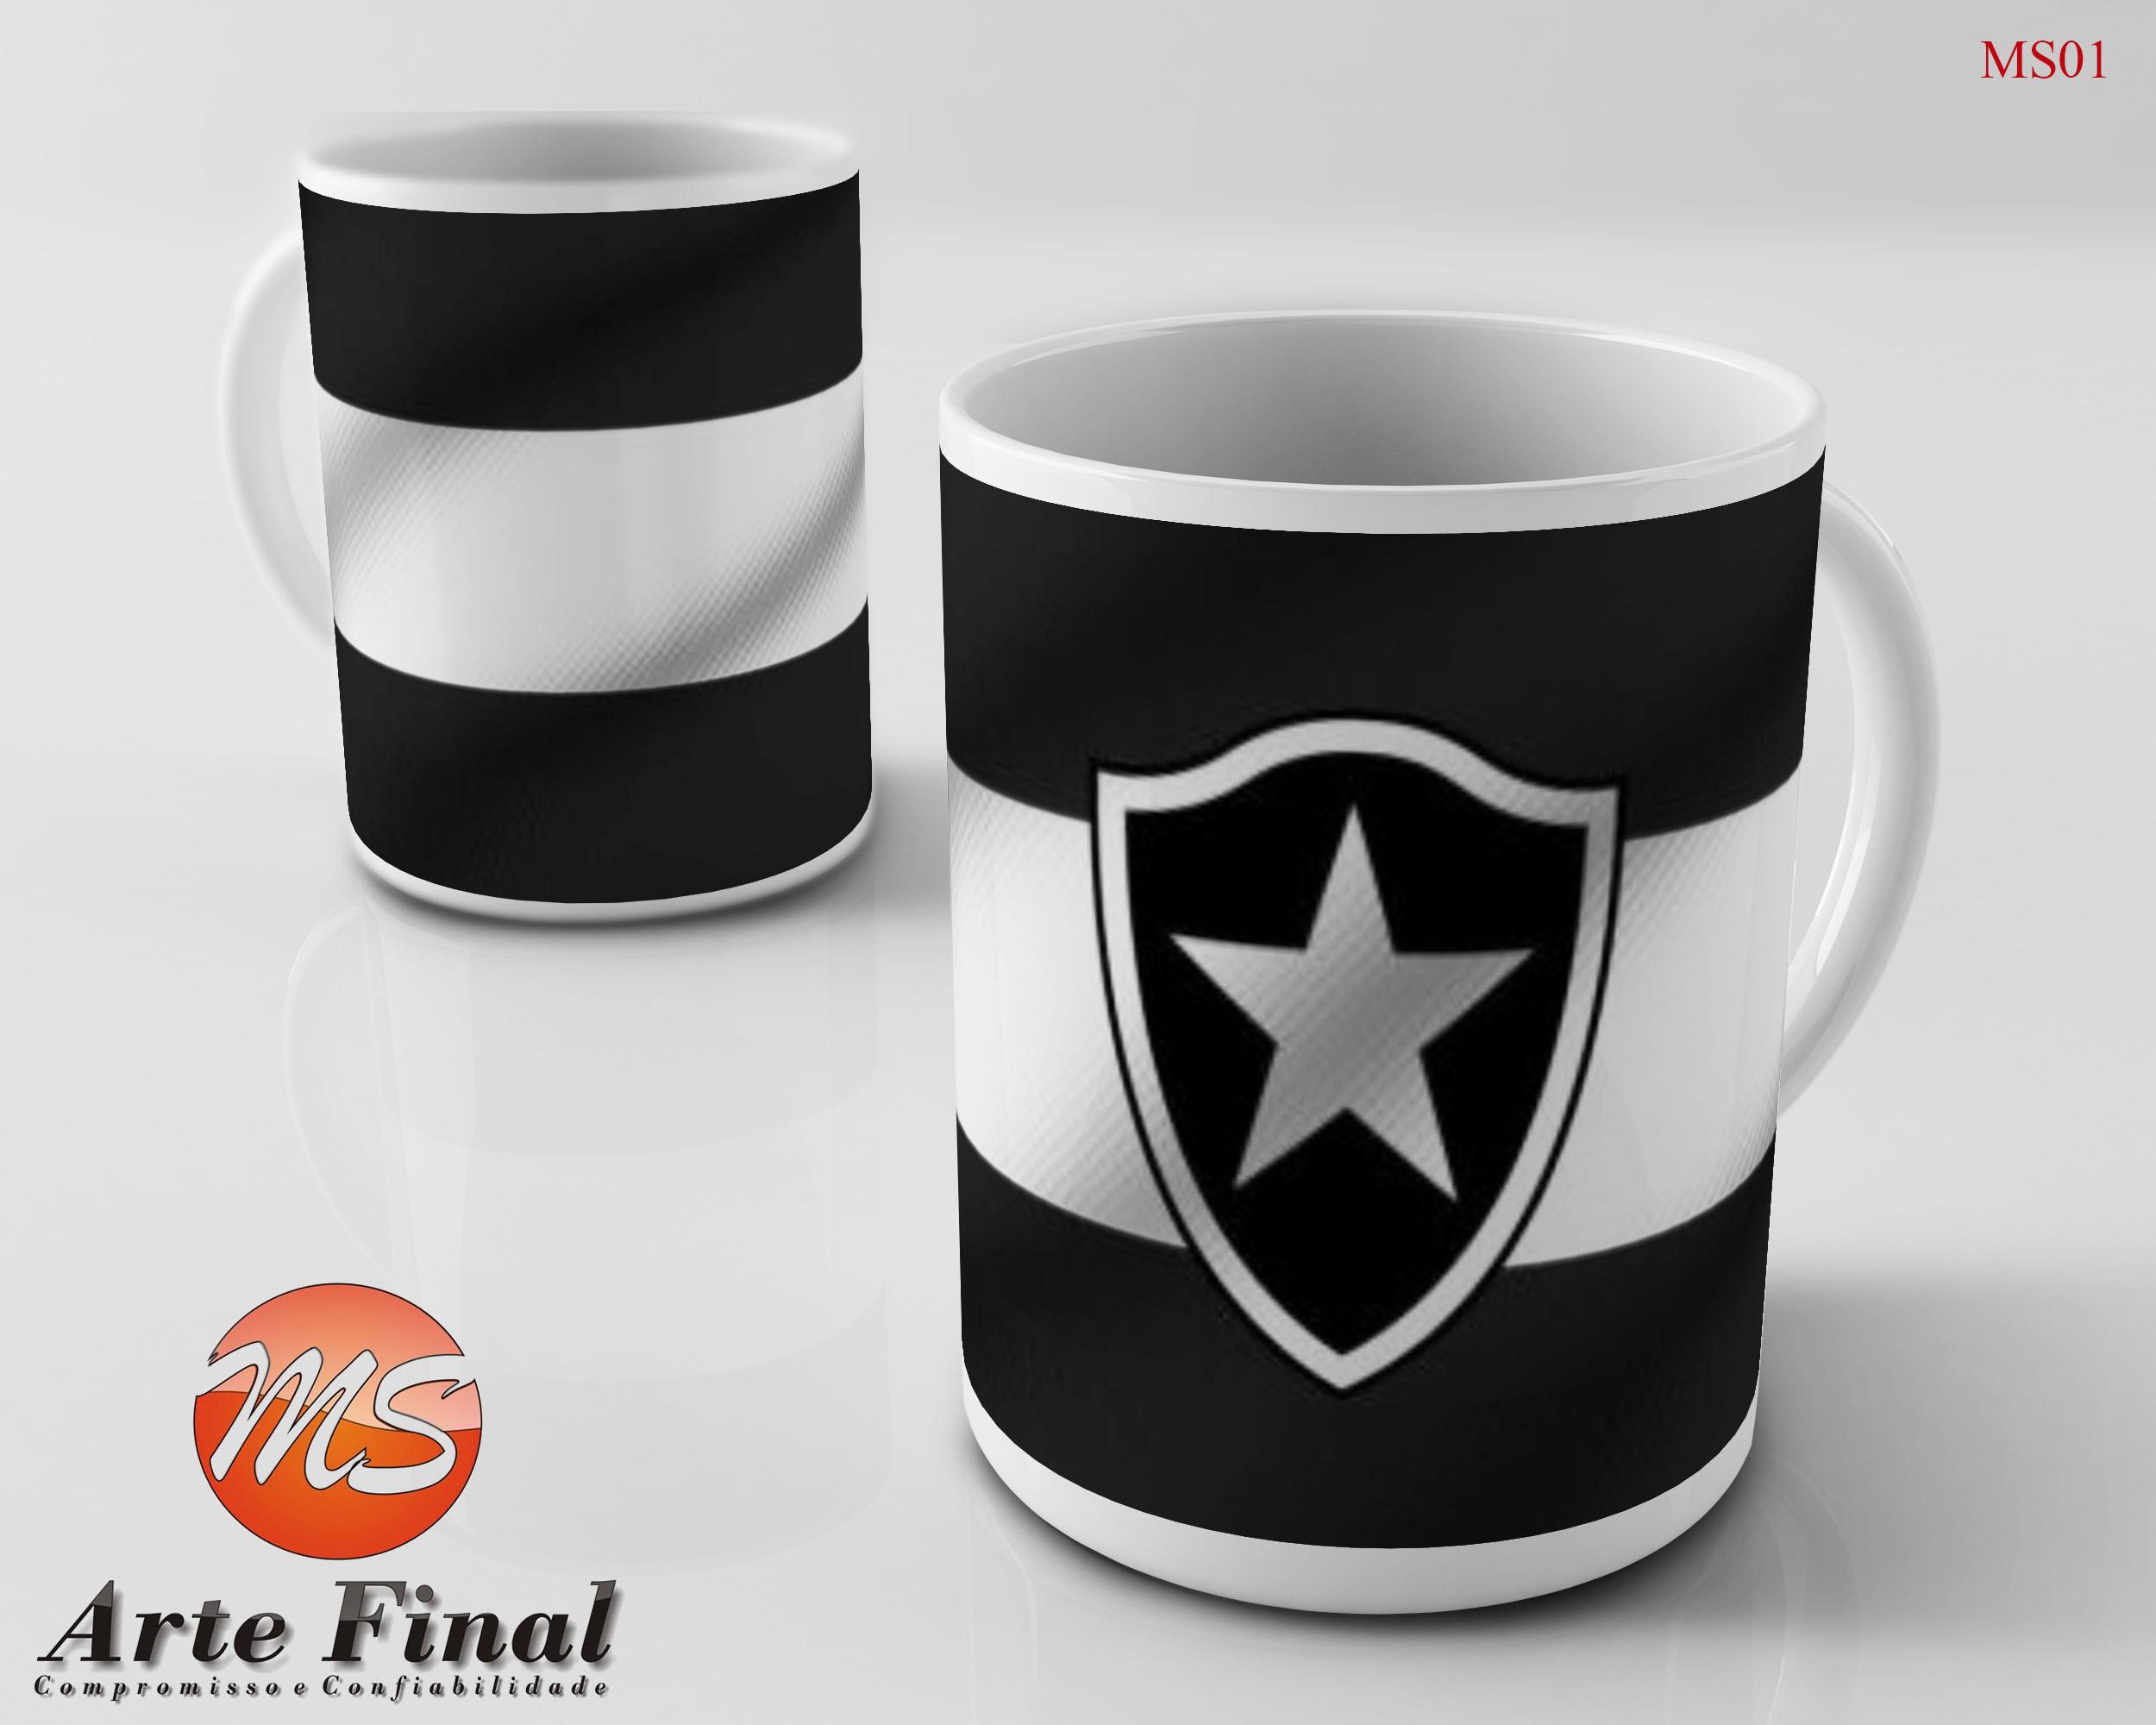 aaf48fda17 Brindes do Botafogo